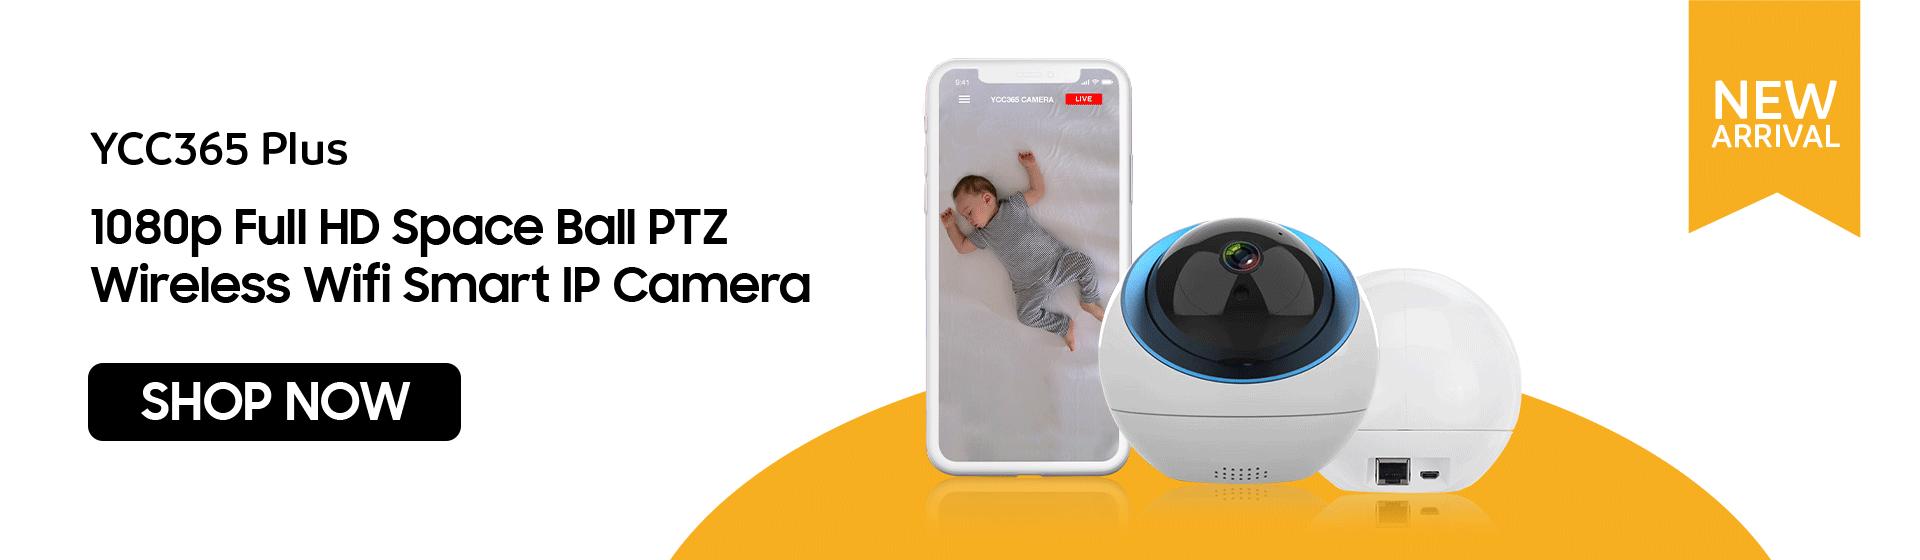 YCC365 Plus 1080p Full HD Space Ball PTZ Wireless Wifi Smart IP Camera